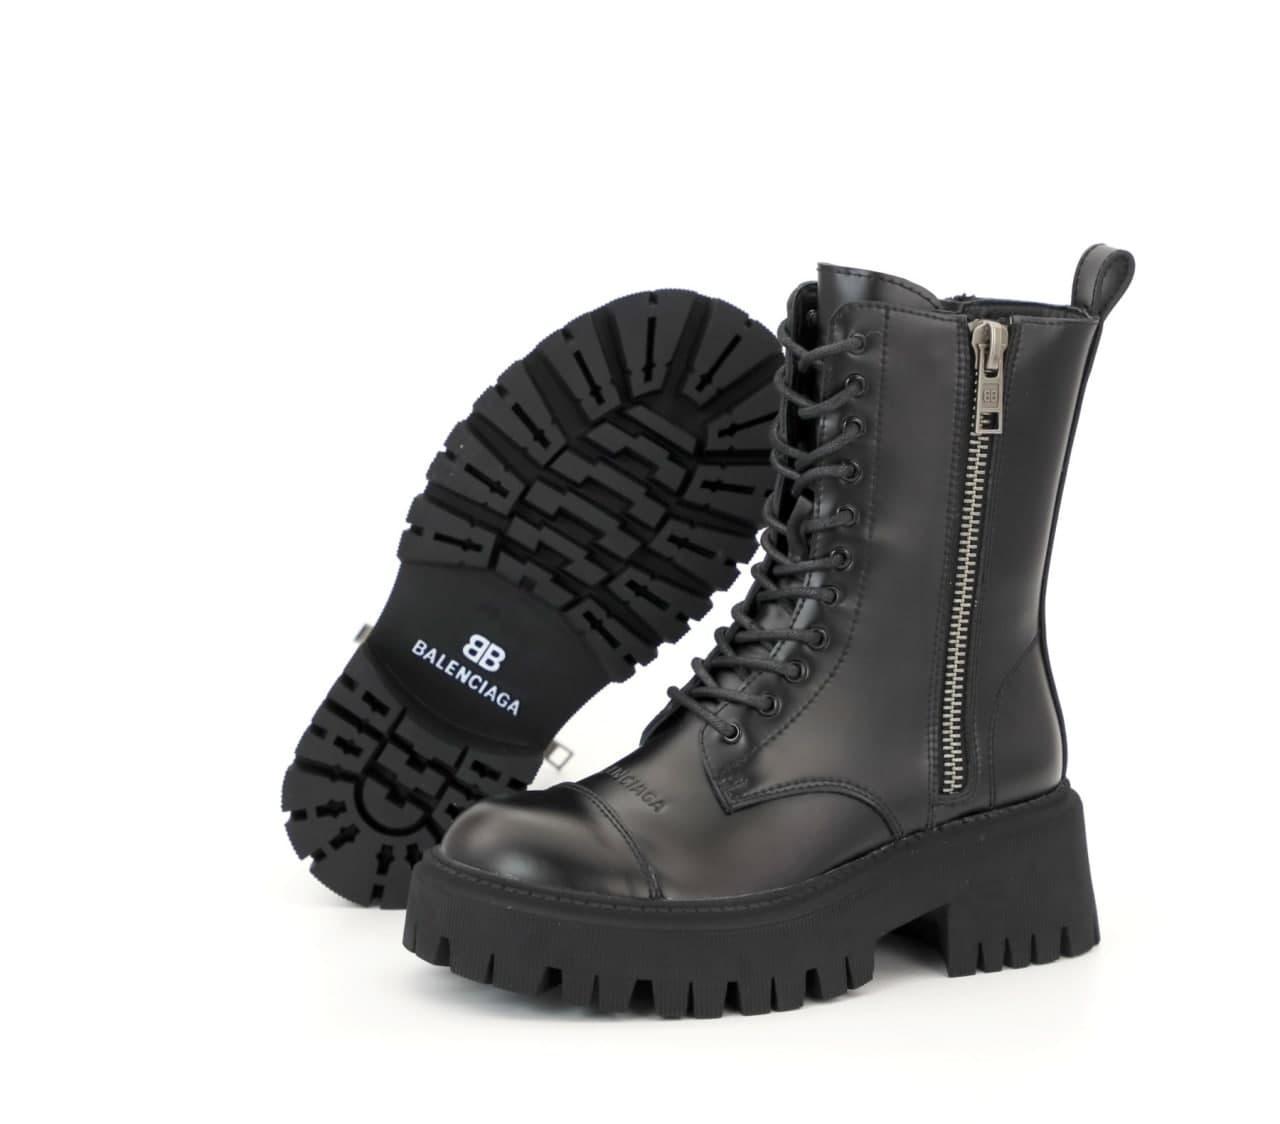 Женские ботинки Bаlenсіagа Tractor 31866 черные